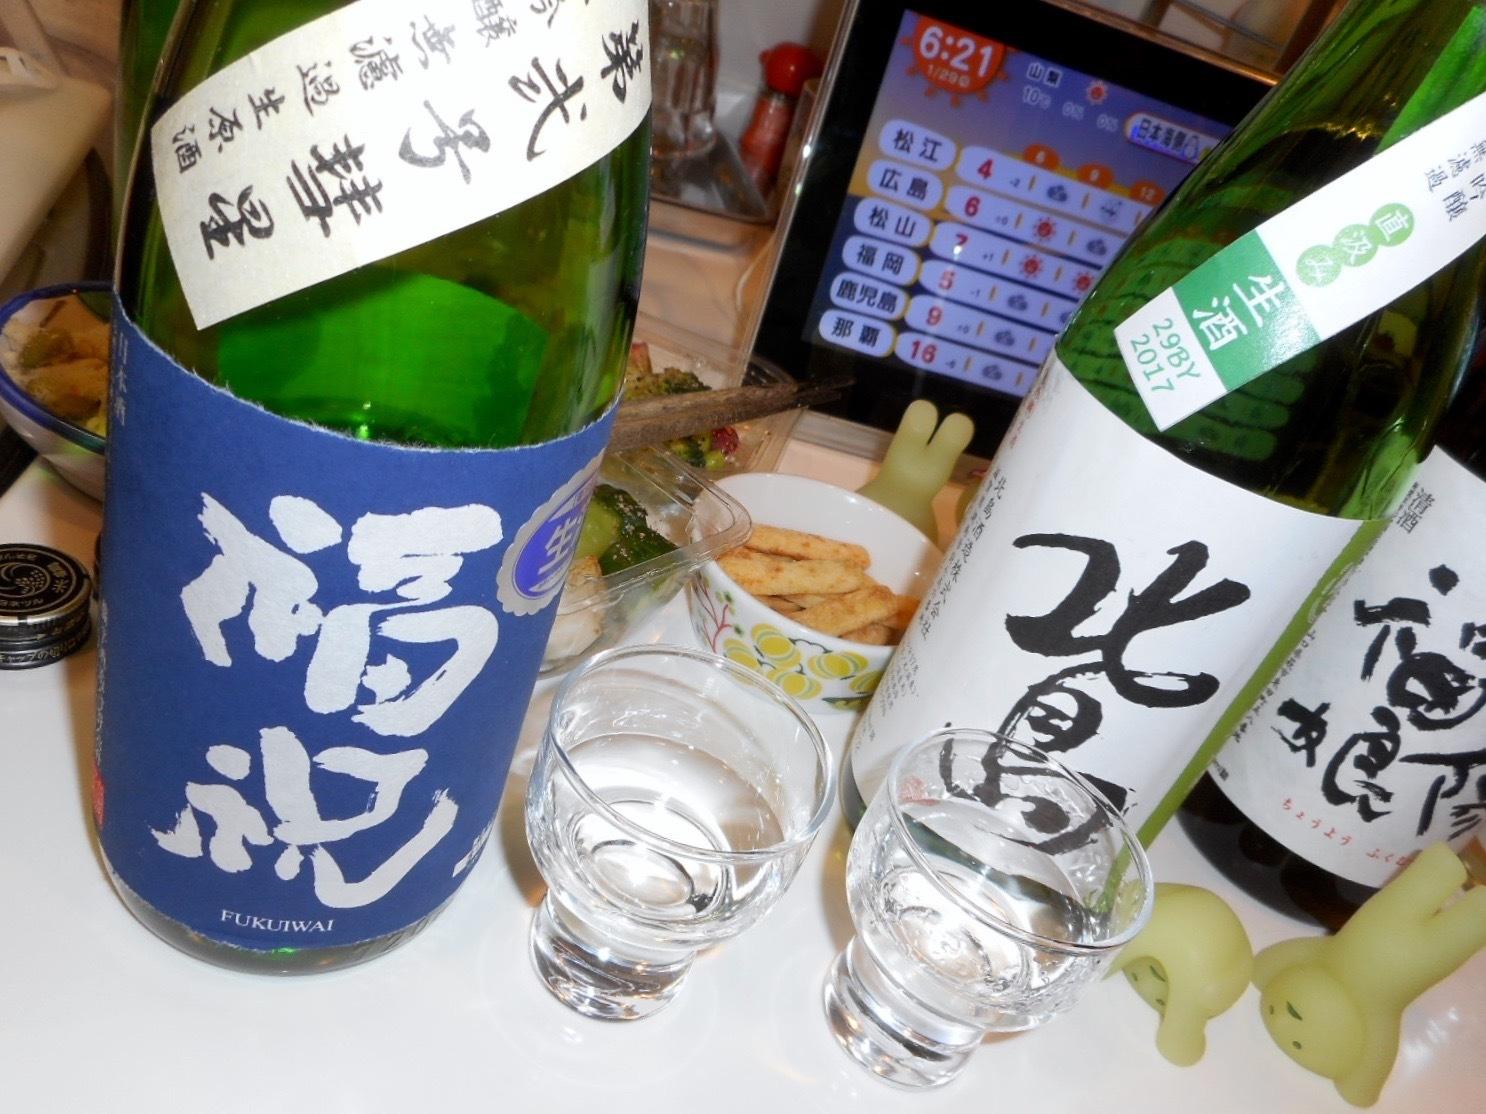 kujira_junmai29by5.jpg